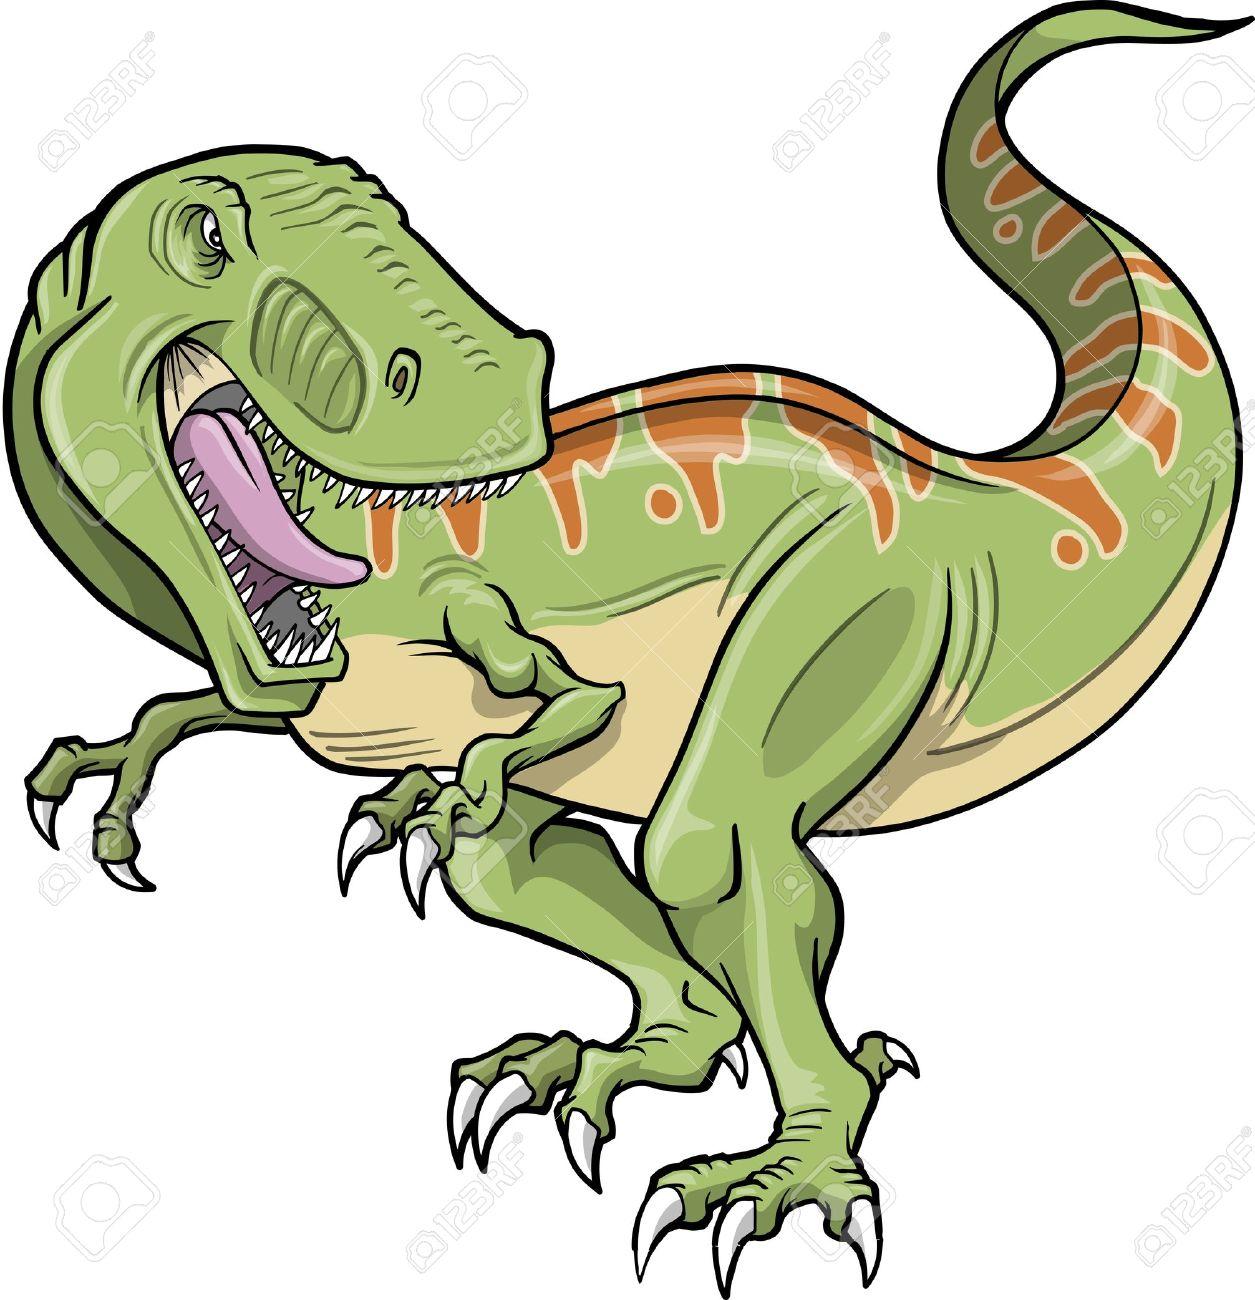 tyrannosaurus t rex dinosaur royalty free cliparts vectors and rh 123rf com tyrannosaurus rex clipart tyrannosaurus rex clipart black and white